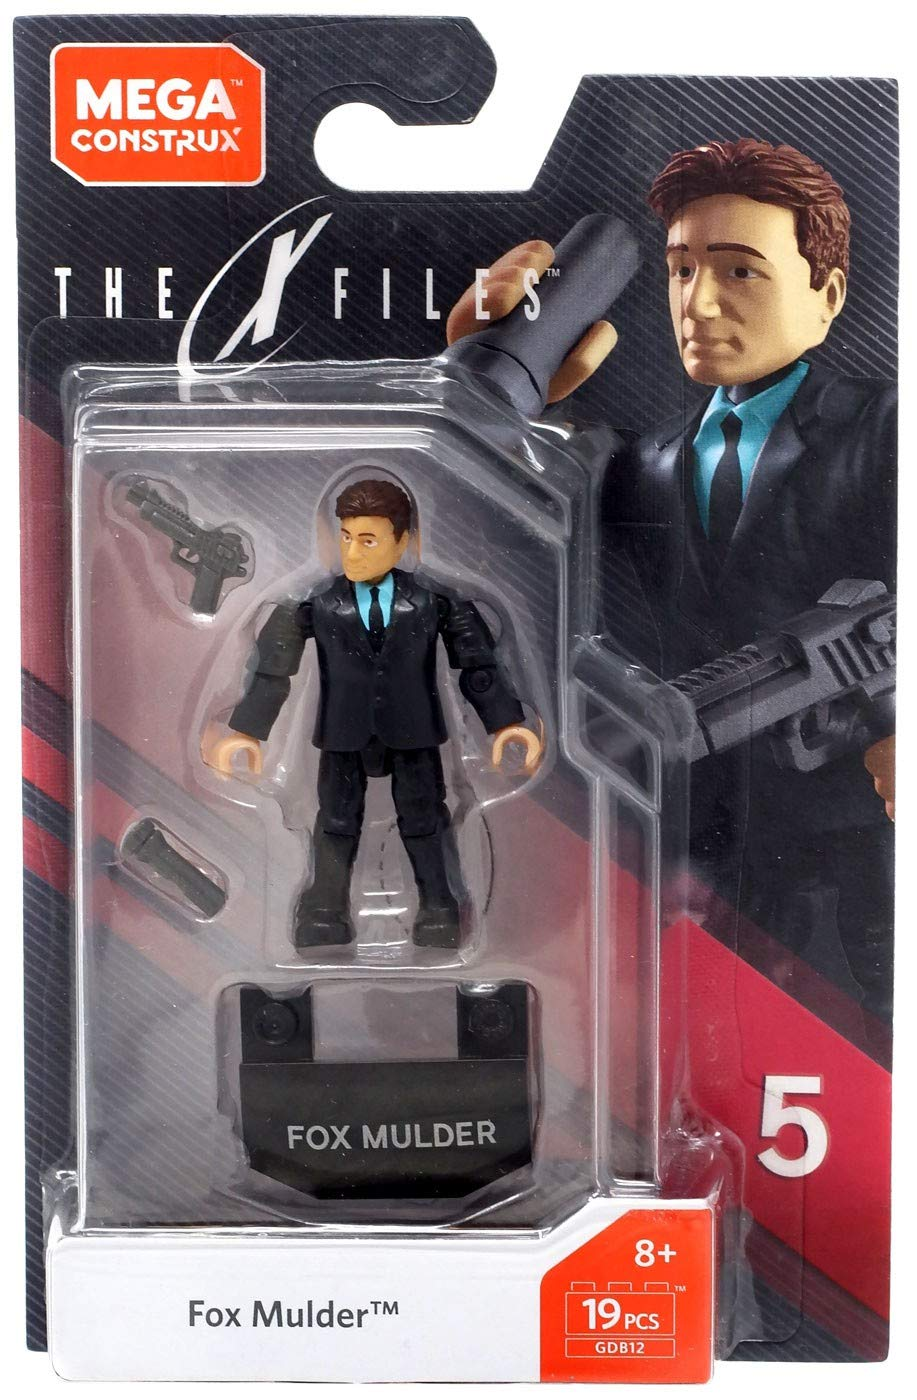 Mega Construx Probuilder Fox Mulder